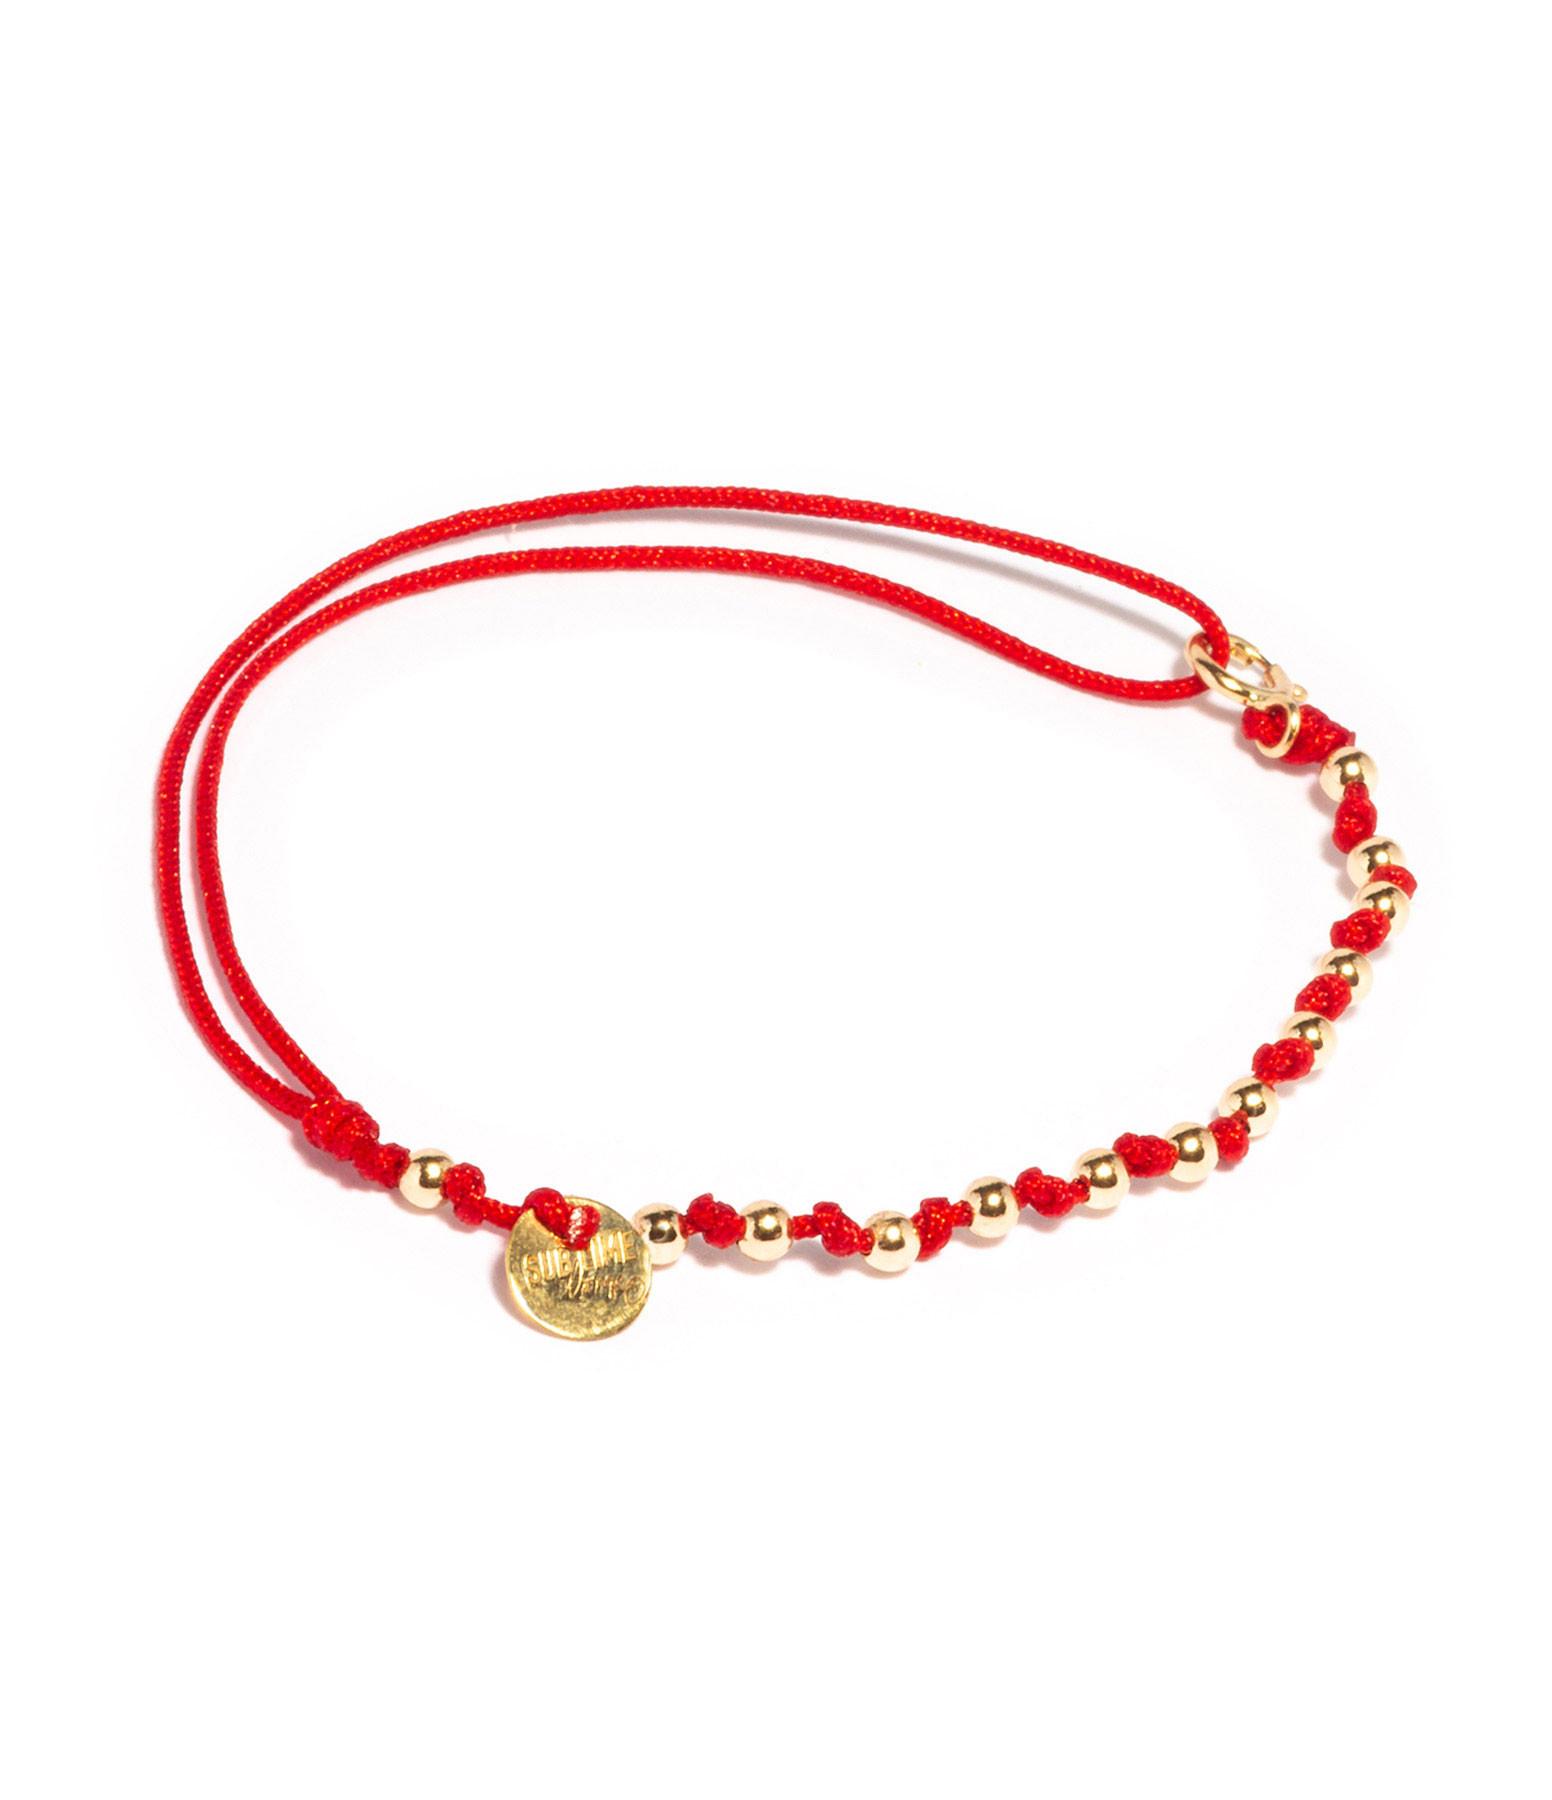 LSONGE - Bracelet Sublime M Comme Méditer 13 Perles Rubis O